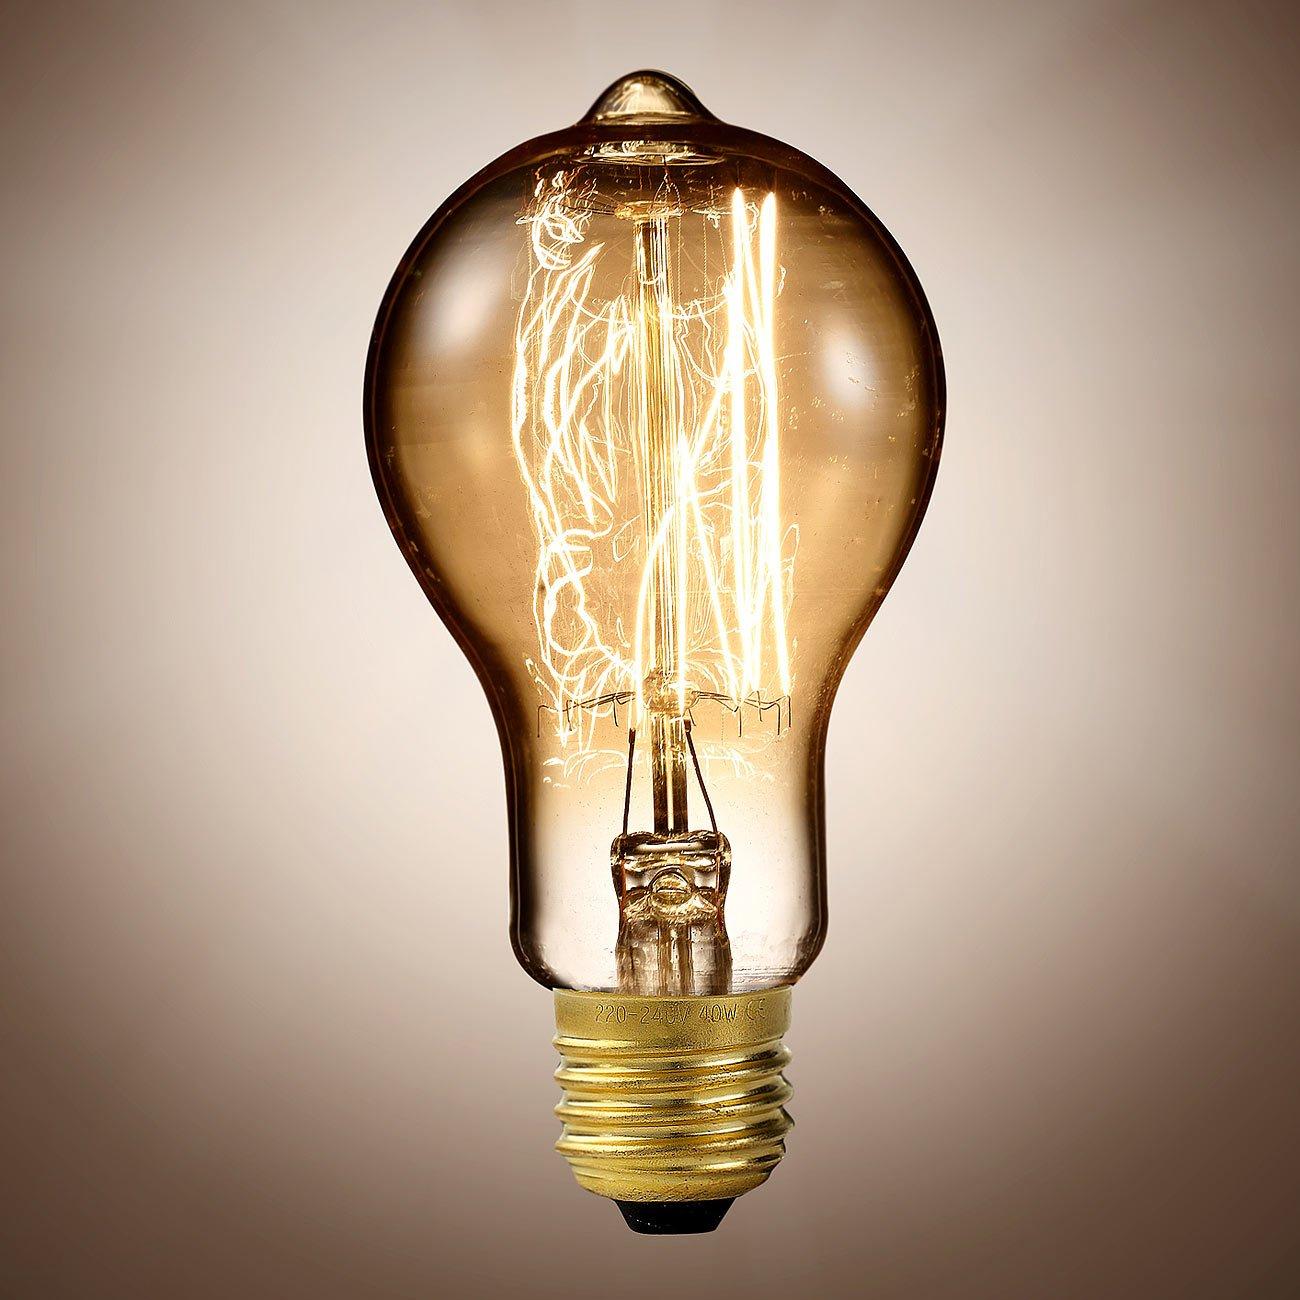 Luminea Edison Lampe: Vintage-Schmucklampe: Amazon.de: Elektronik